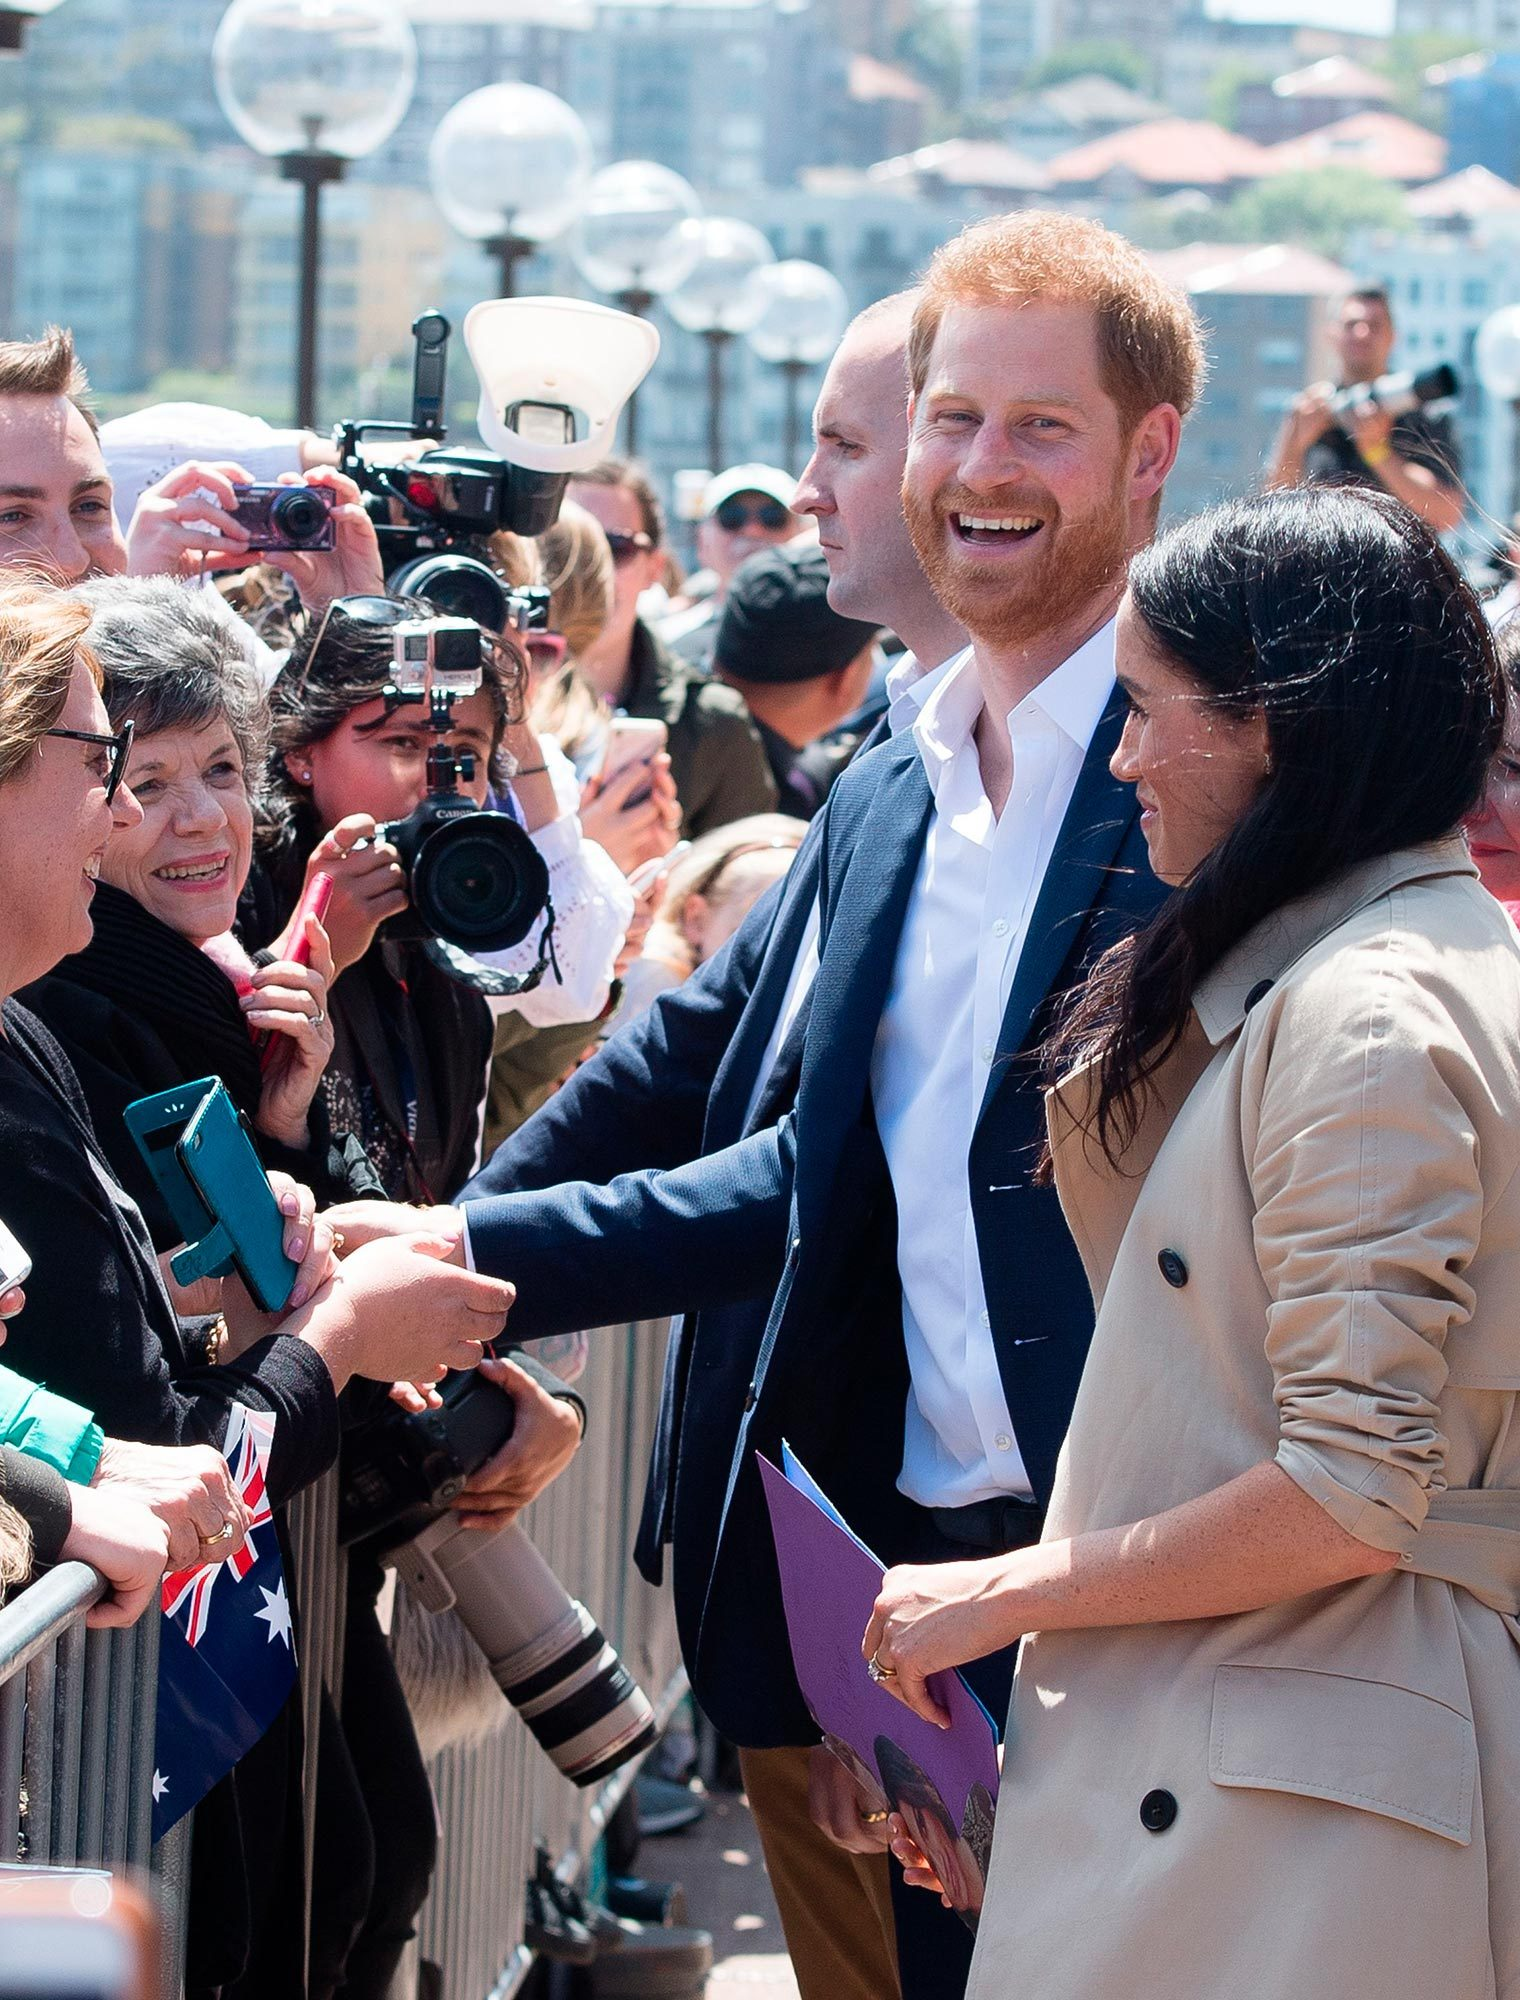 Duke and Duchess of Sussex arrive in Sydney, Australia